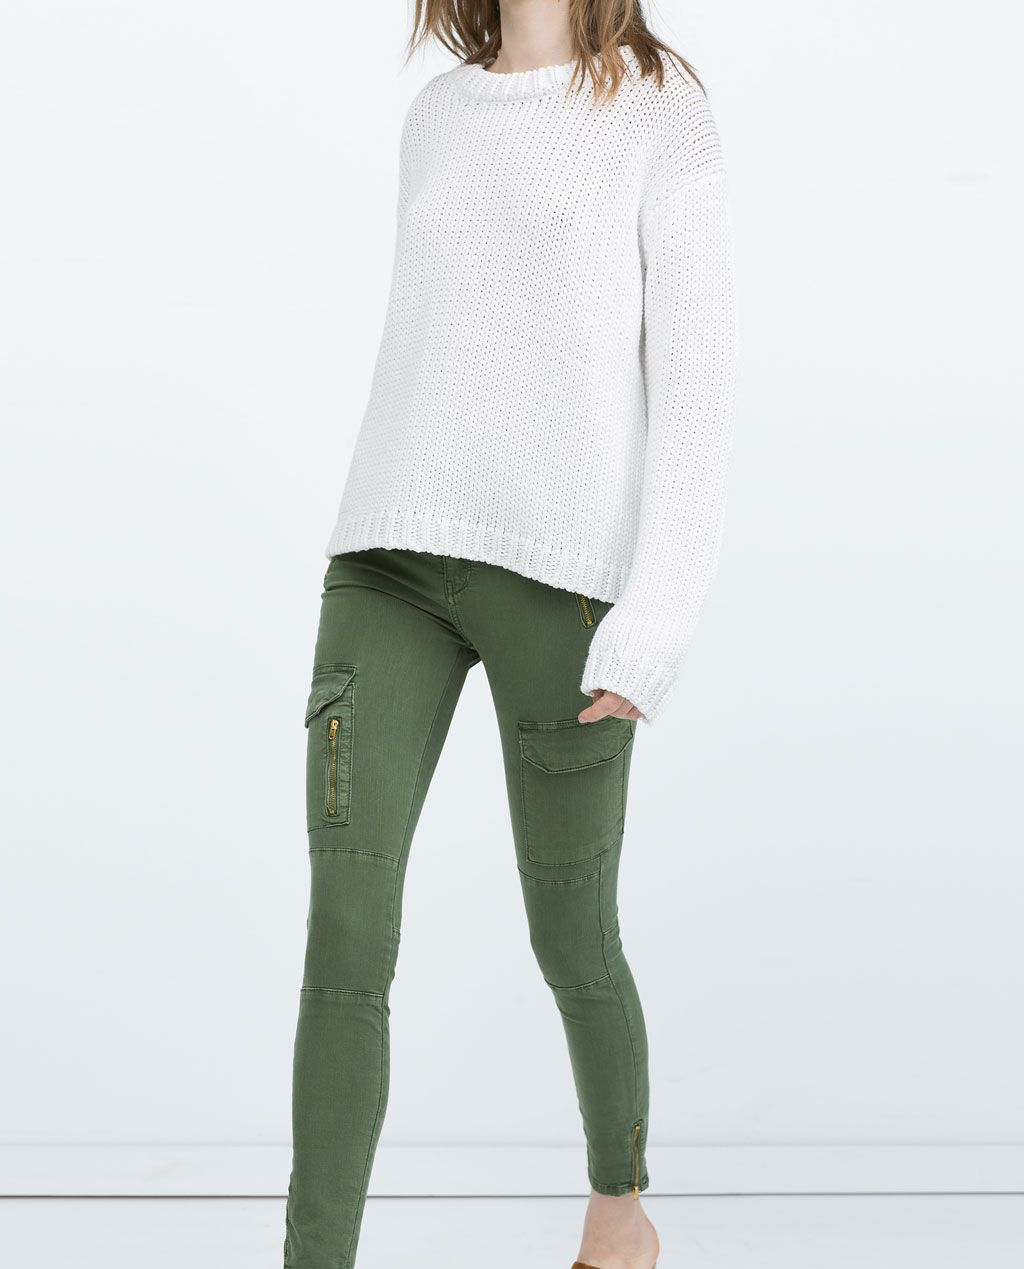 pantalon militaire zara homme fashion designs. Black Bedroom Furniture Sets. Home Design Ideas